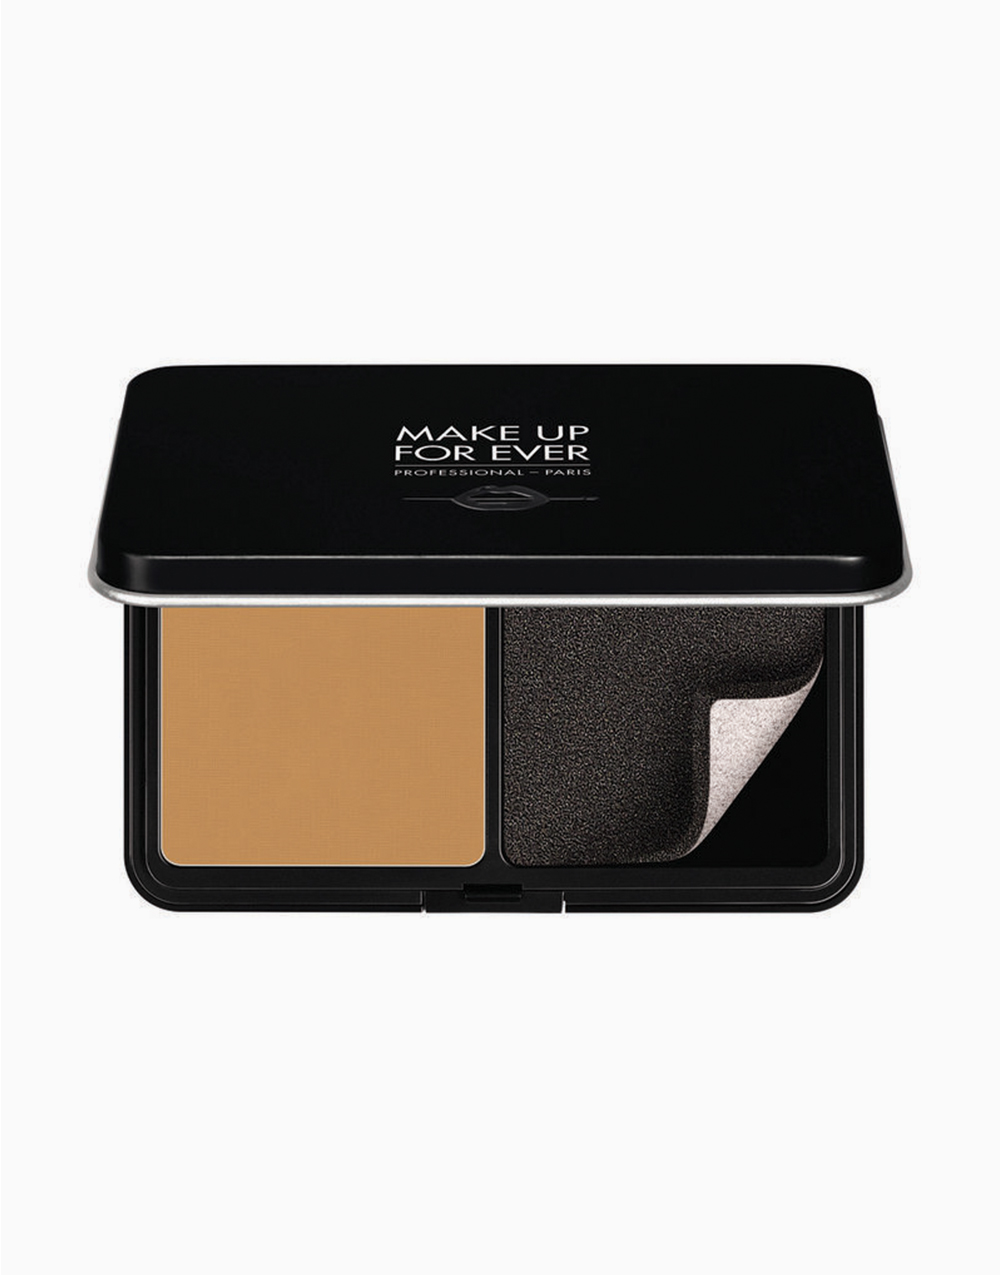 Matte Velvet Skin Compact (11g) by Make Up For Ever | Y415